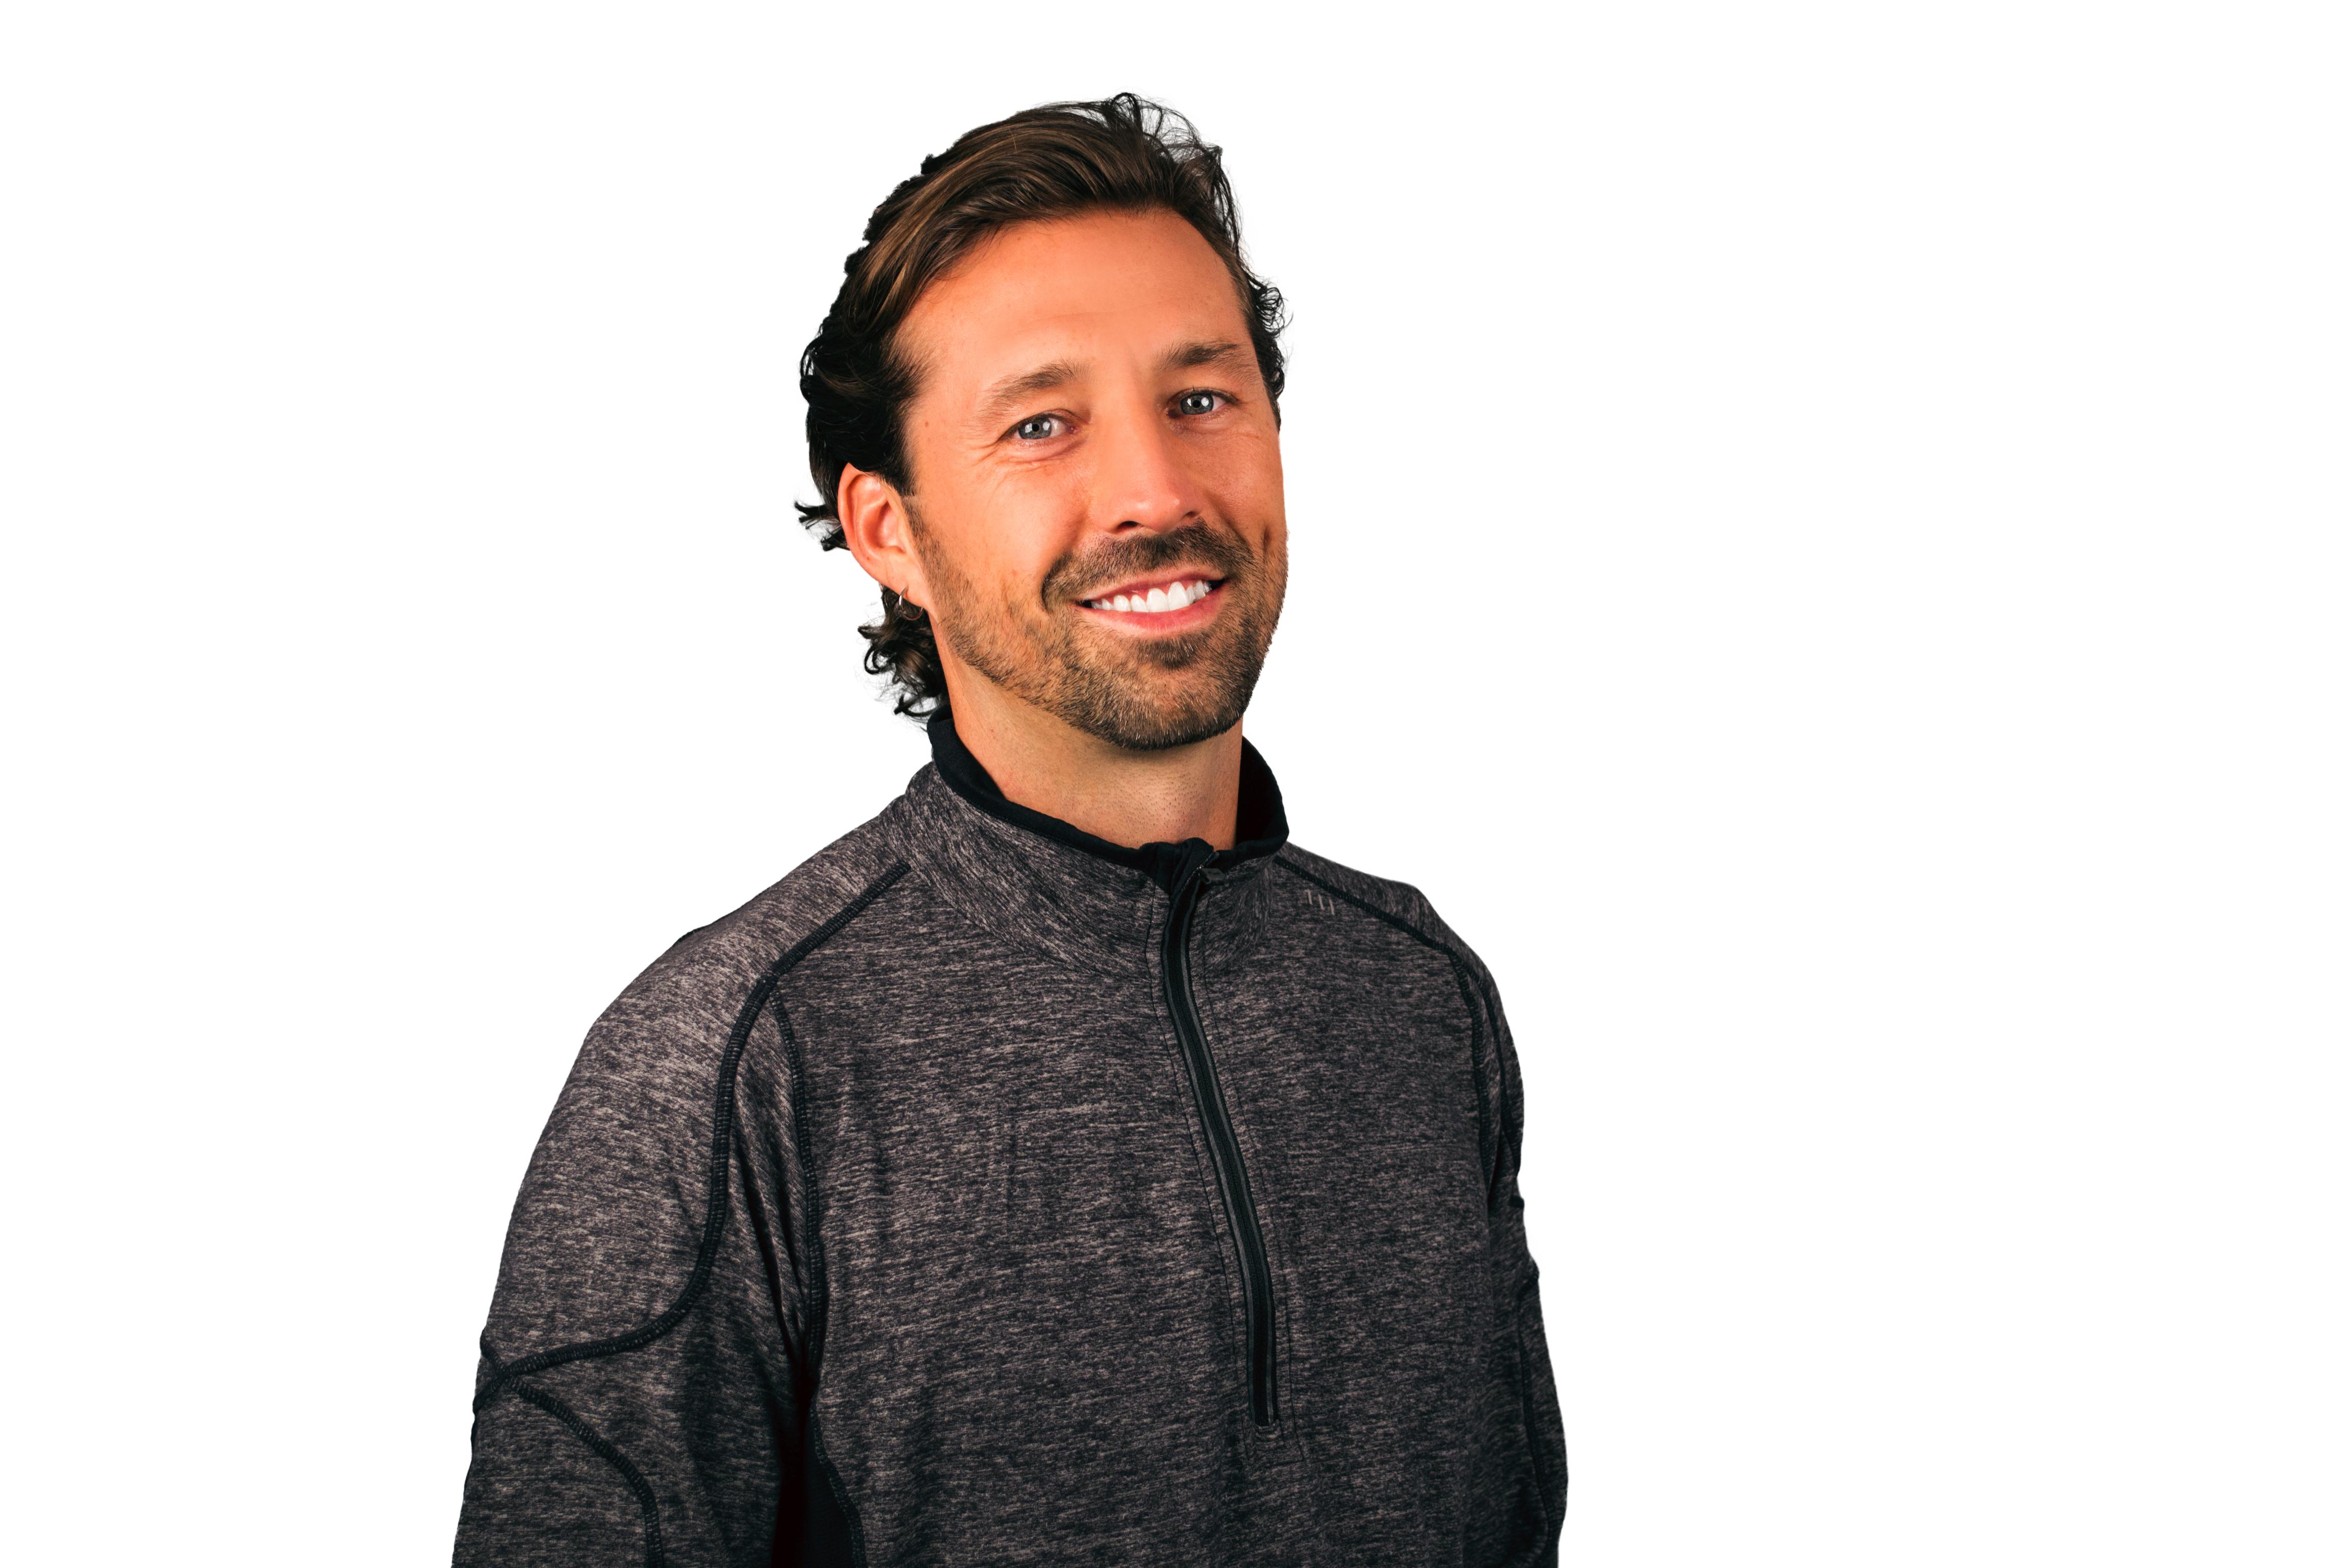 Dan McDonald on Life Changes With Filippo - Radio Show #287